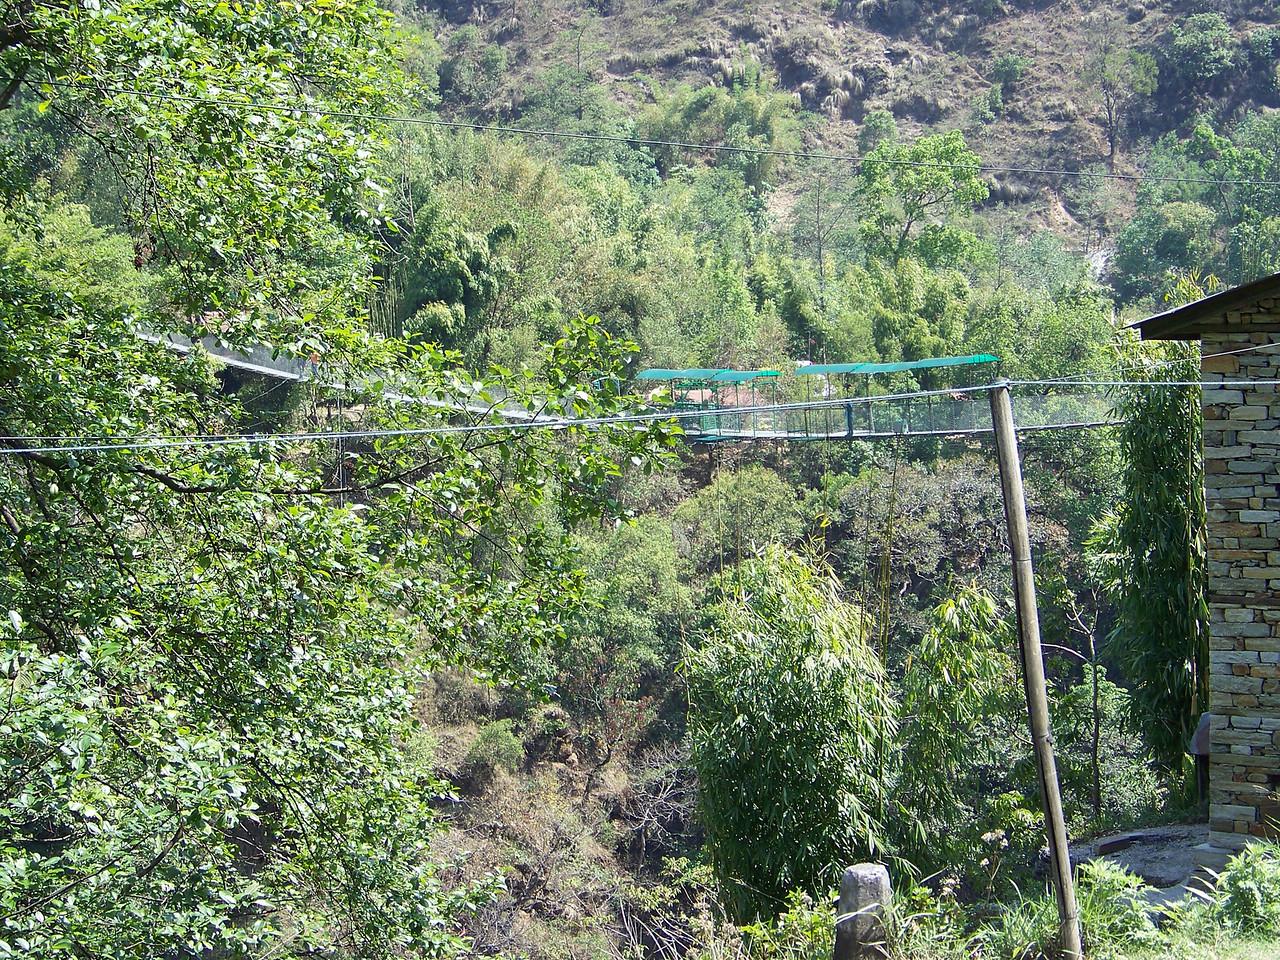 0646 - Locals Walking Bridge along Araniko Highway in Nepal Between Kodari and Katmandu - Nepal.JPG